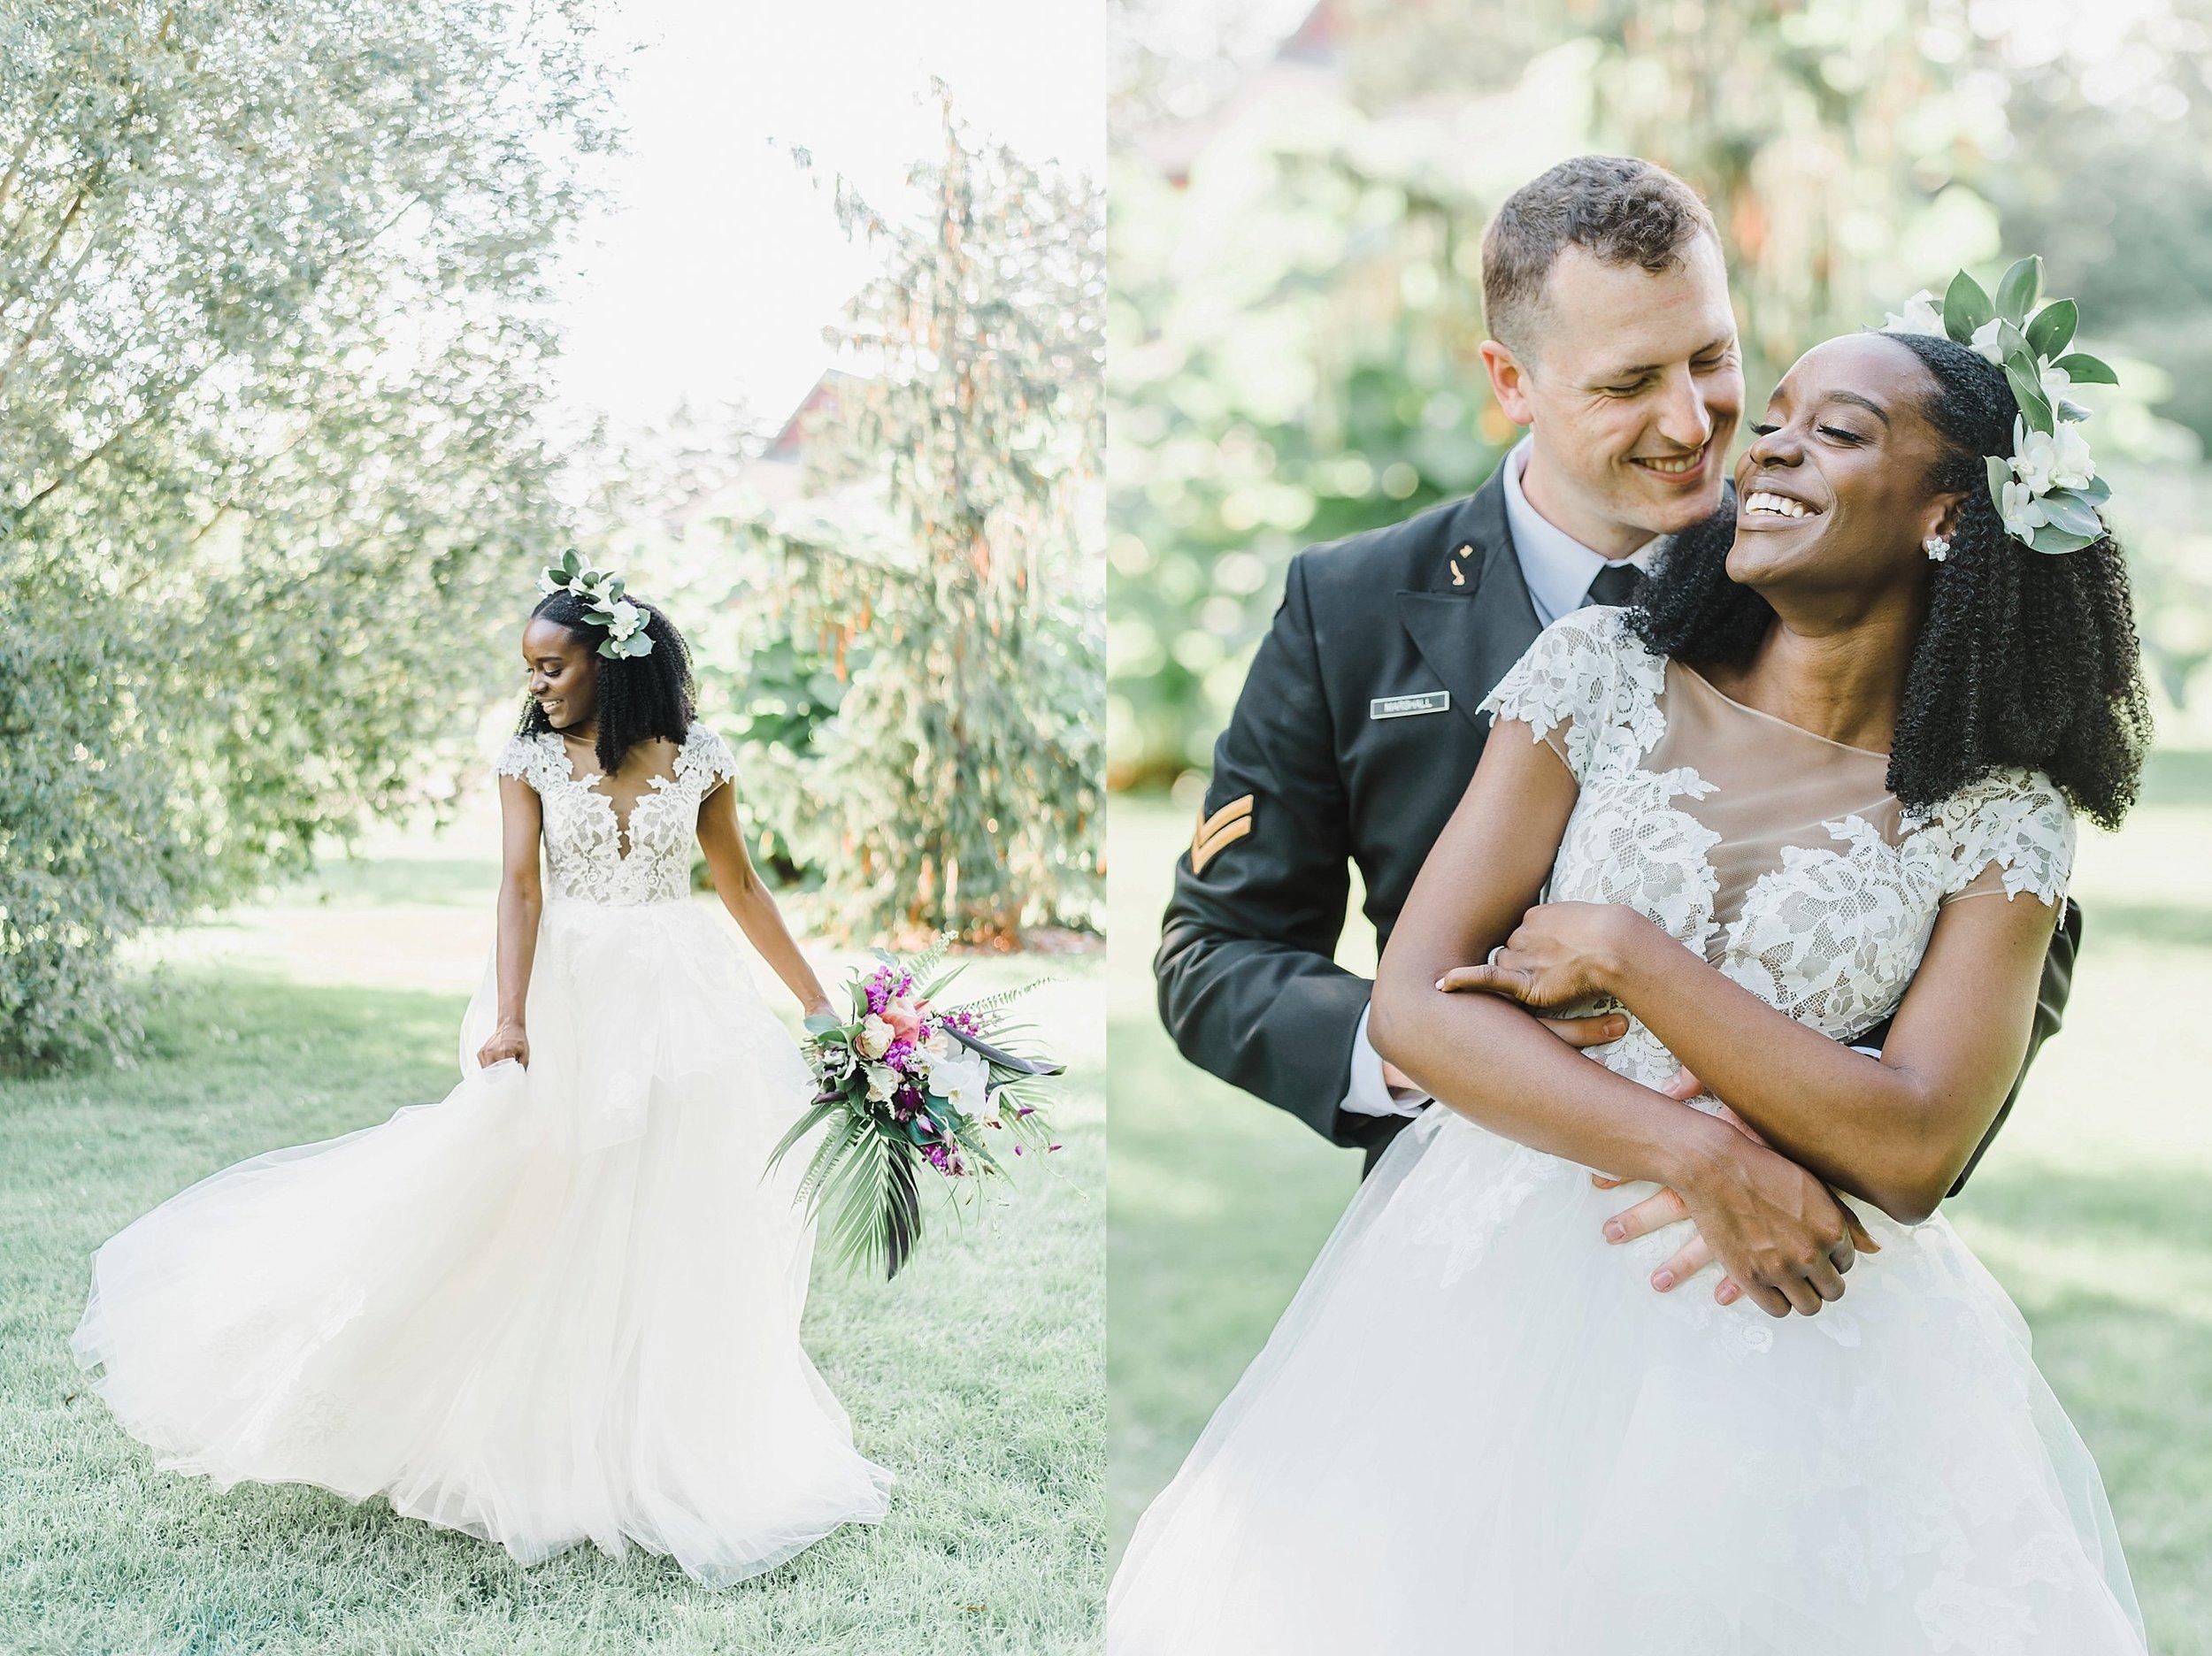 light airy indie fine art ottawa wedding photographer | Ali and Batoul Photography_1004.jpg